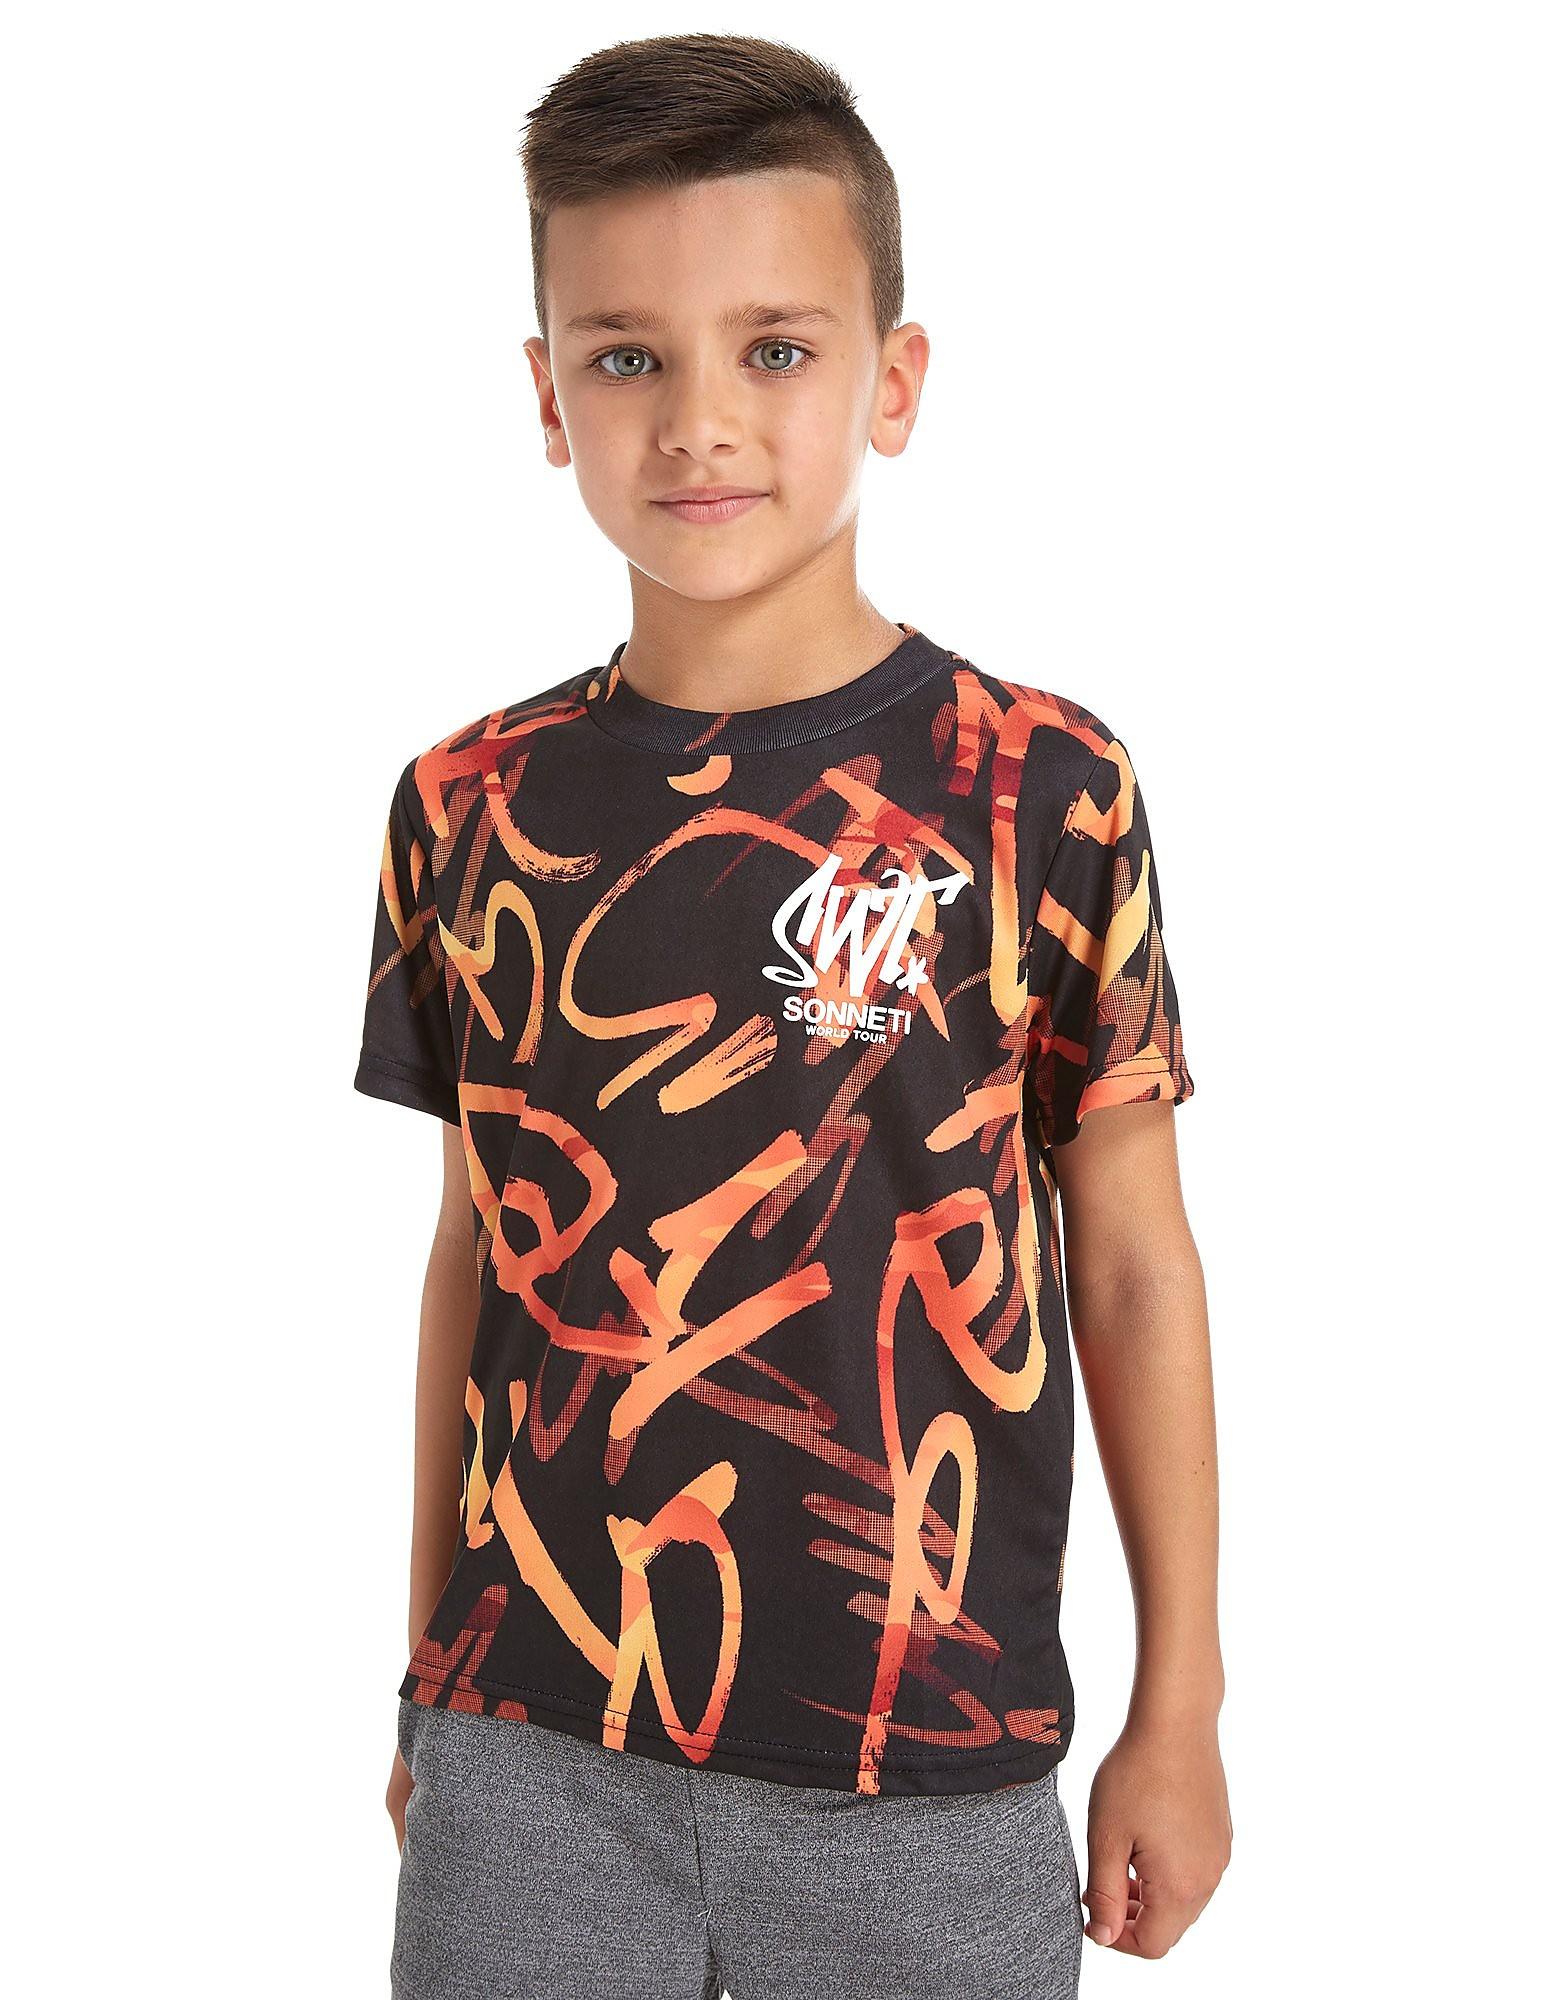 Sonneti Dimil T-Shirt Enfant